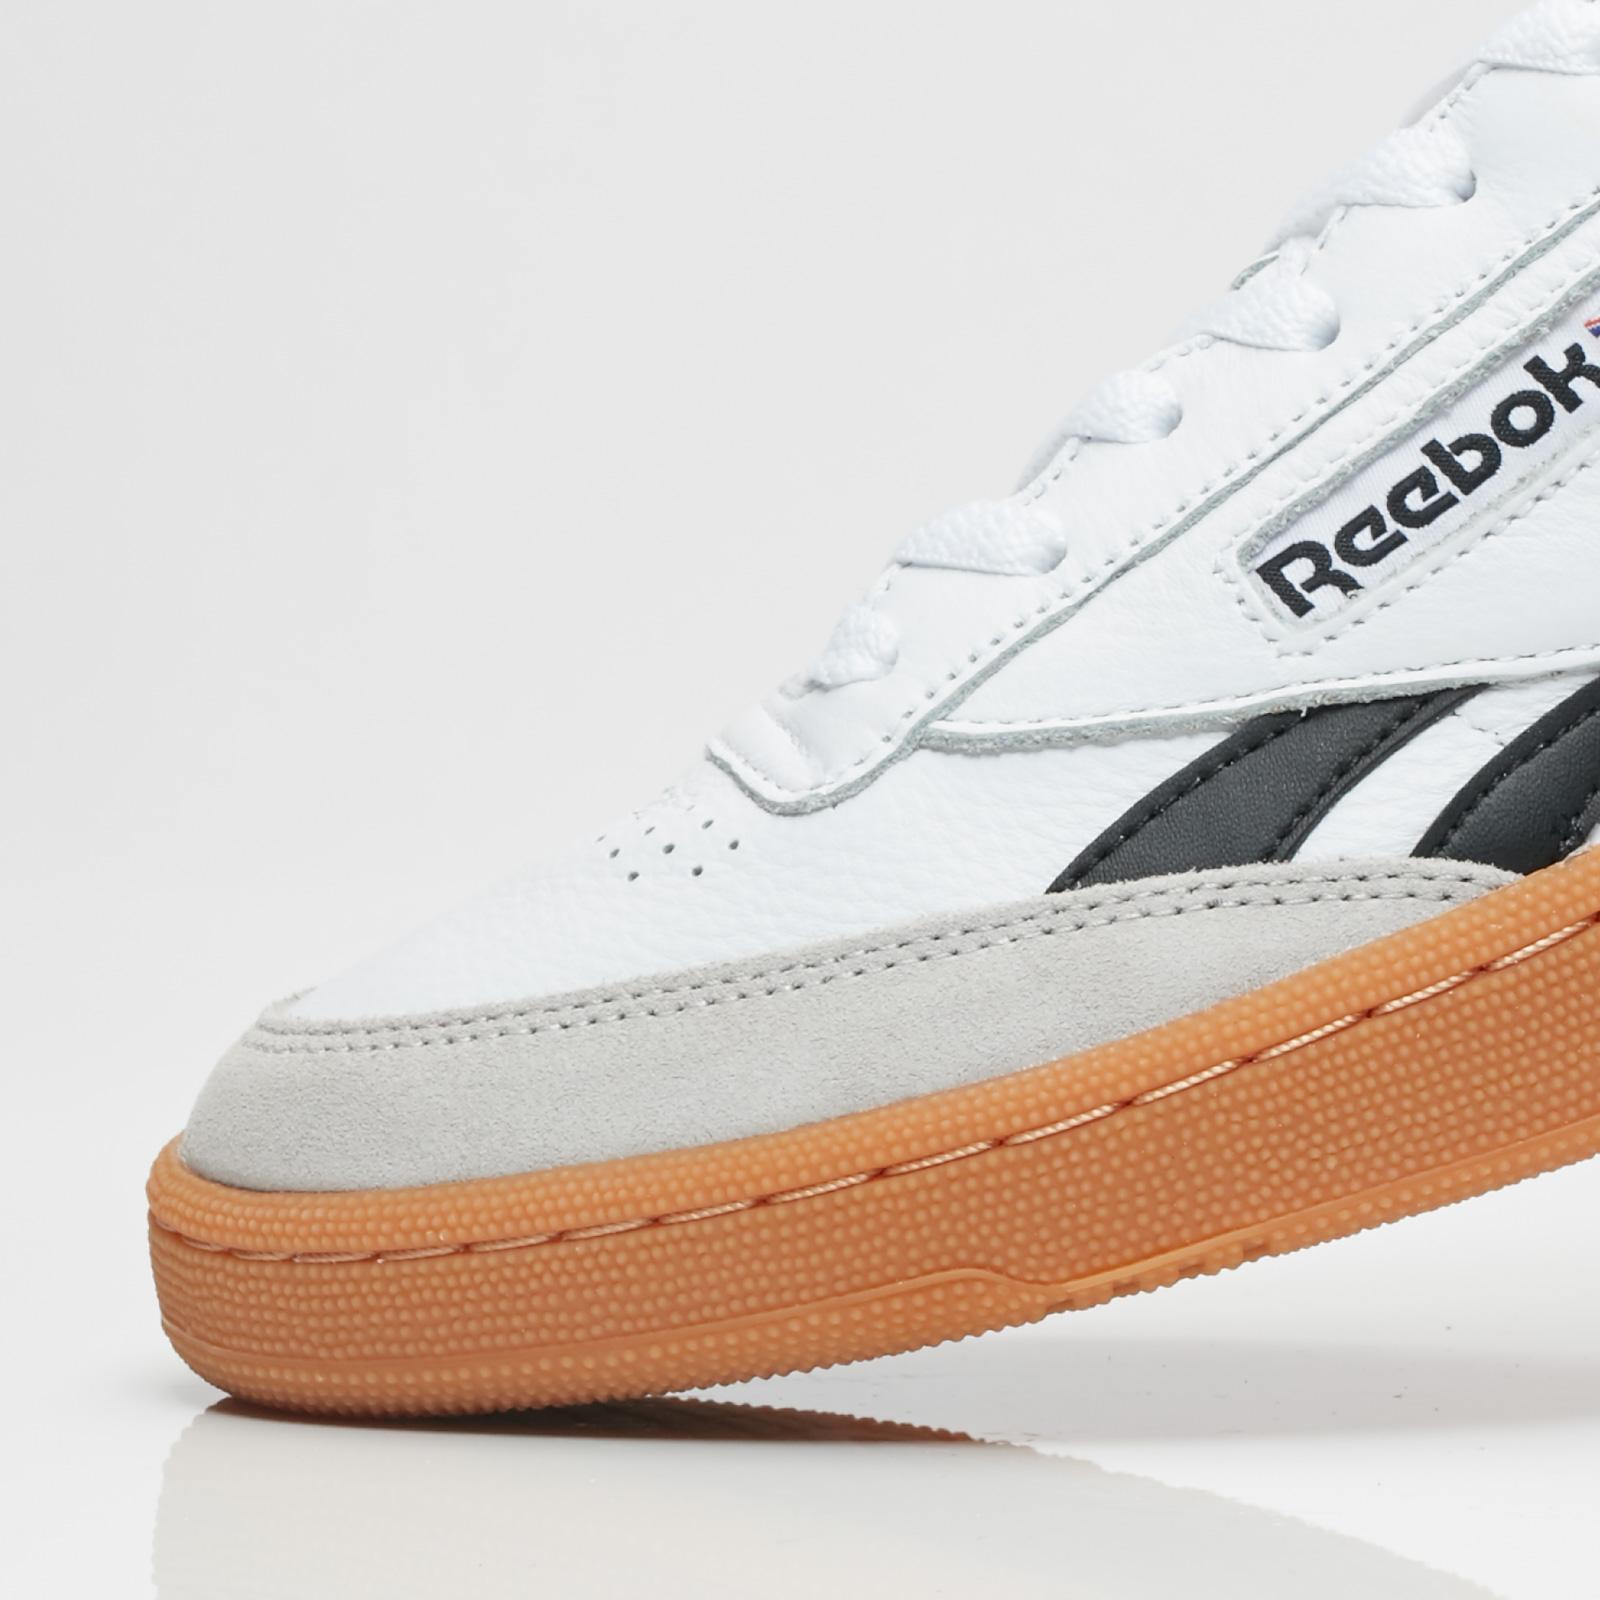 eba4a2a6212bf6 Reebok Revenge Plus Gum - Cm8791 - Sneakersnstuff